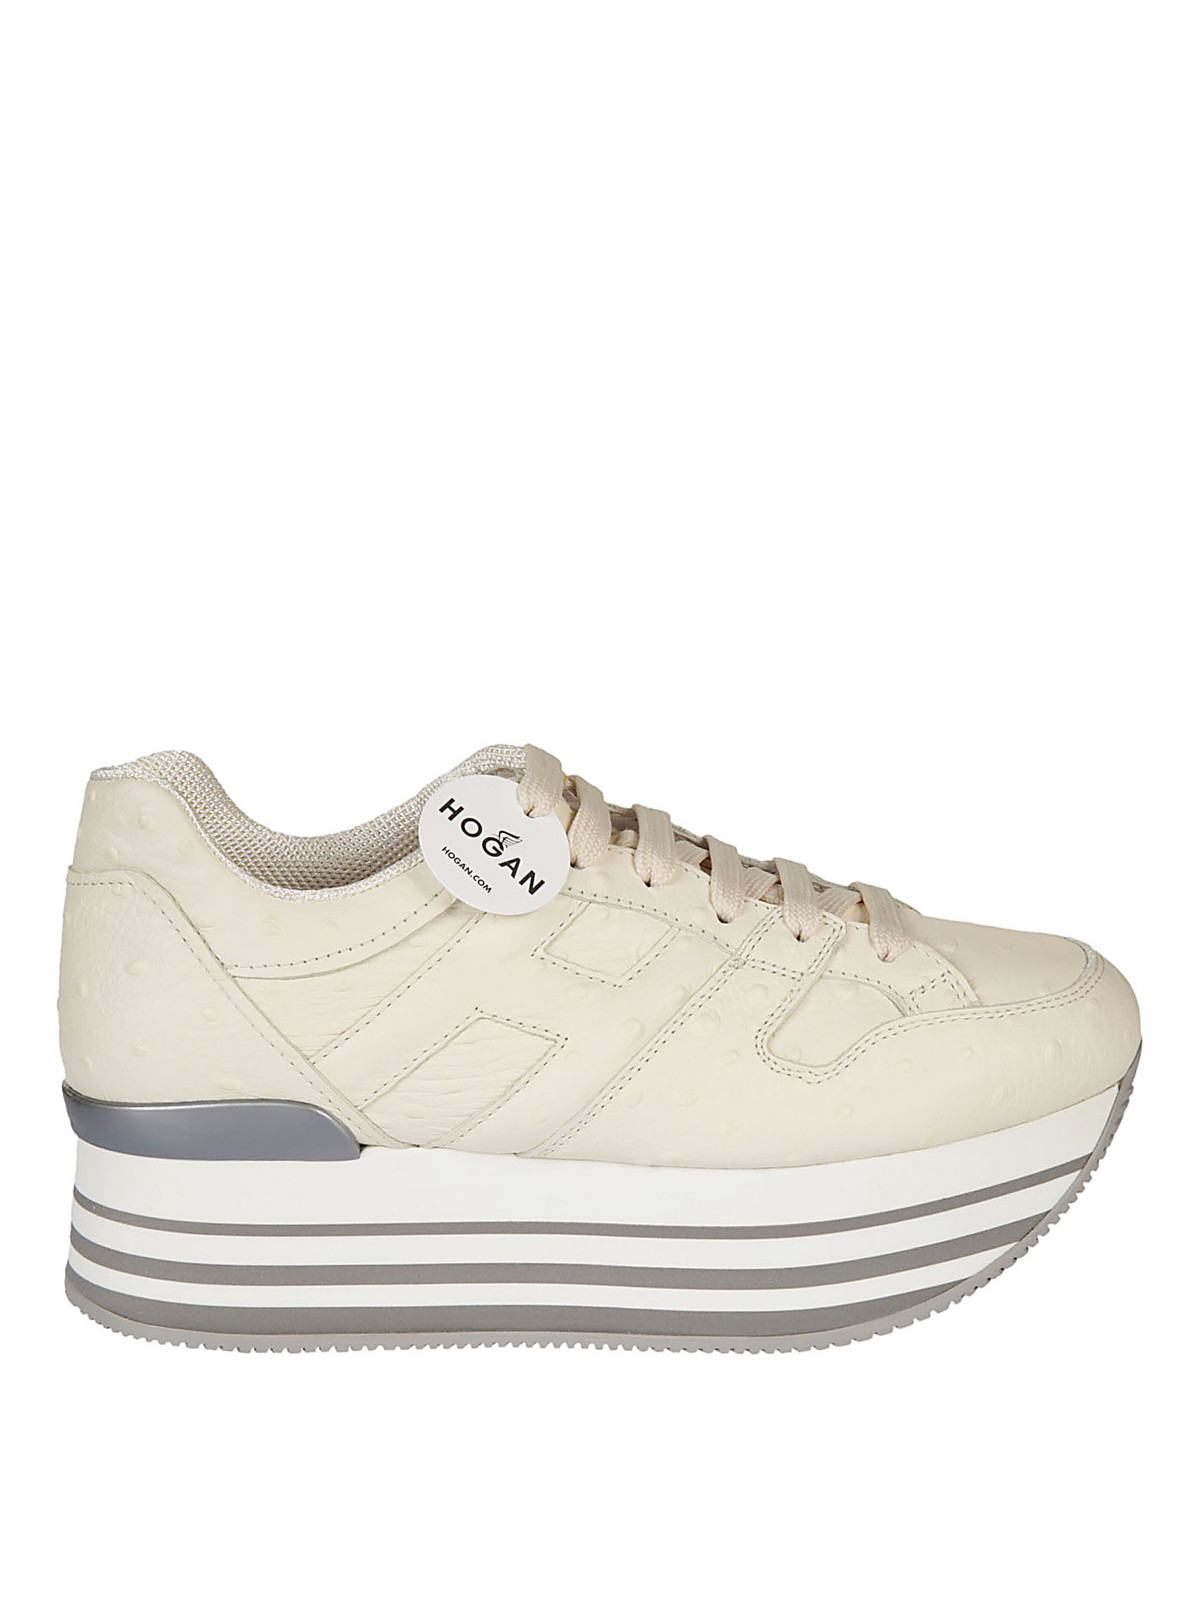 Hogan - Maxi 222 ostrich print sneakers - trainers ...